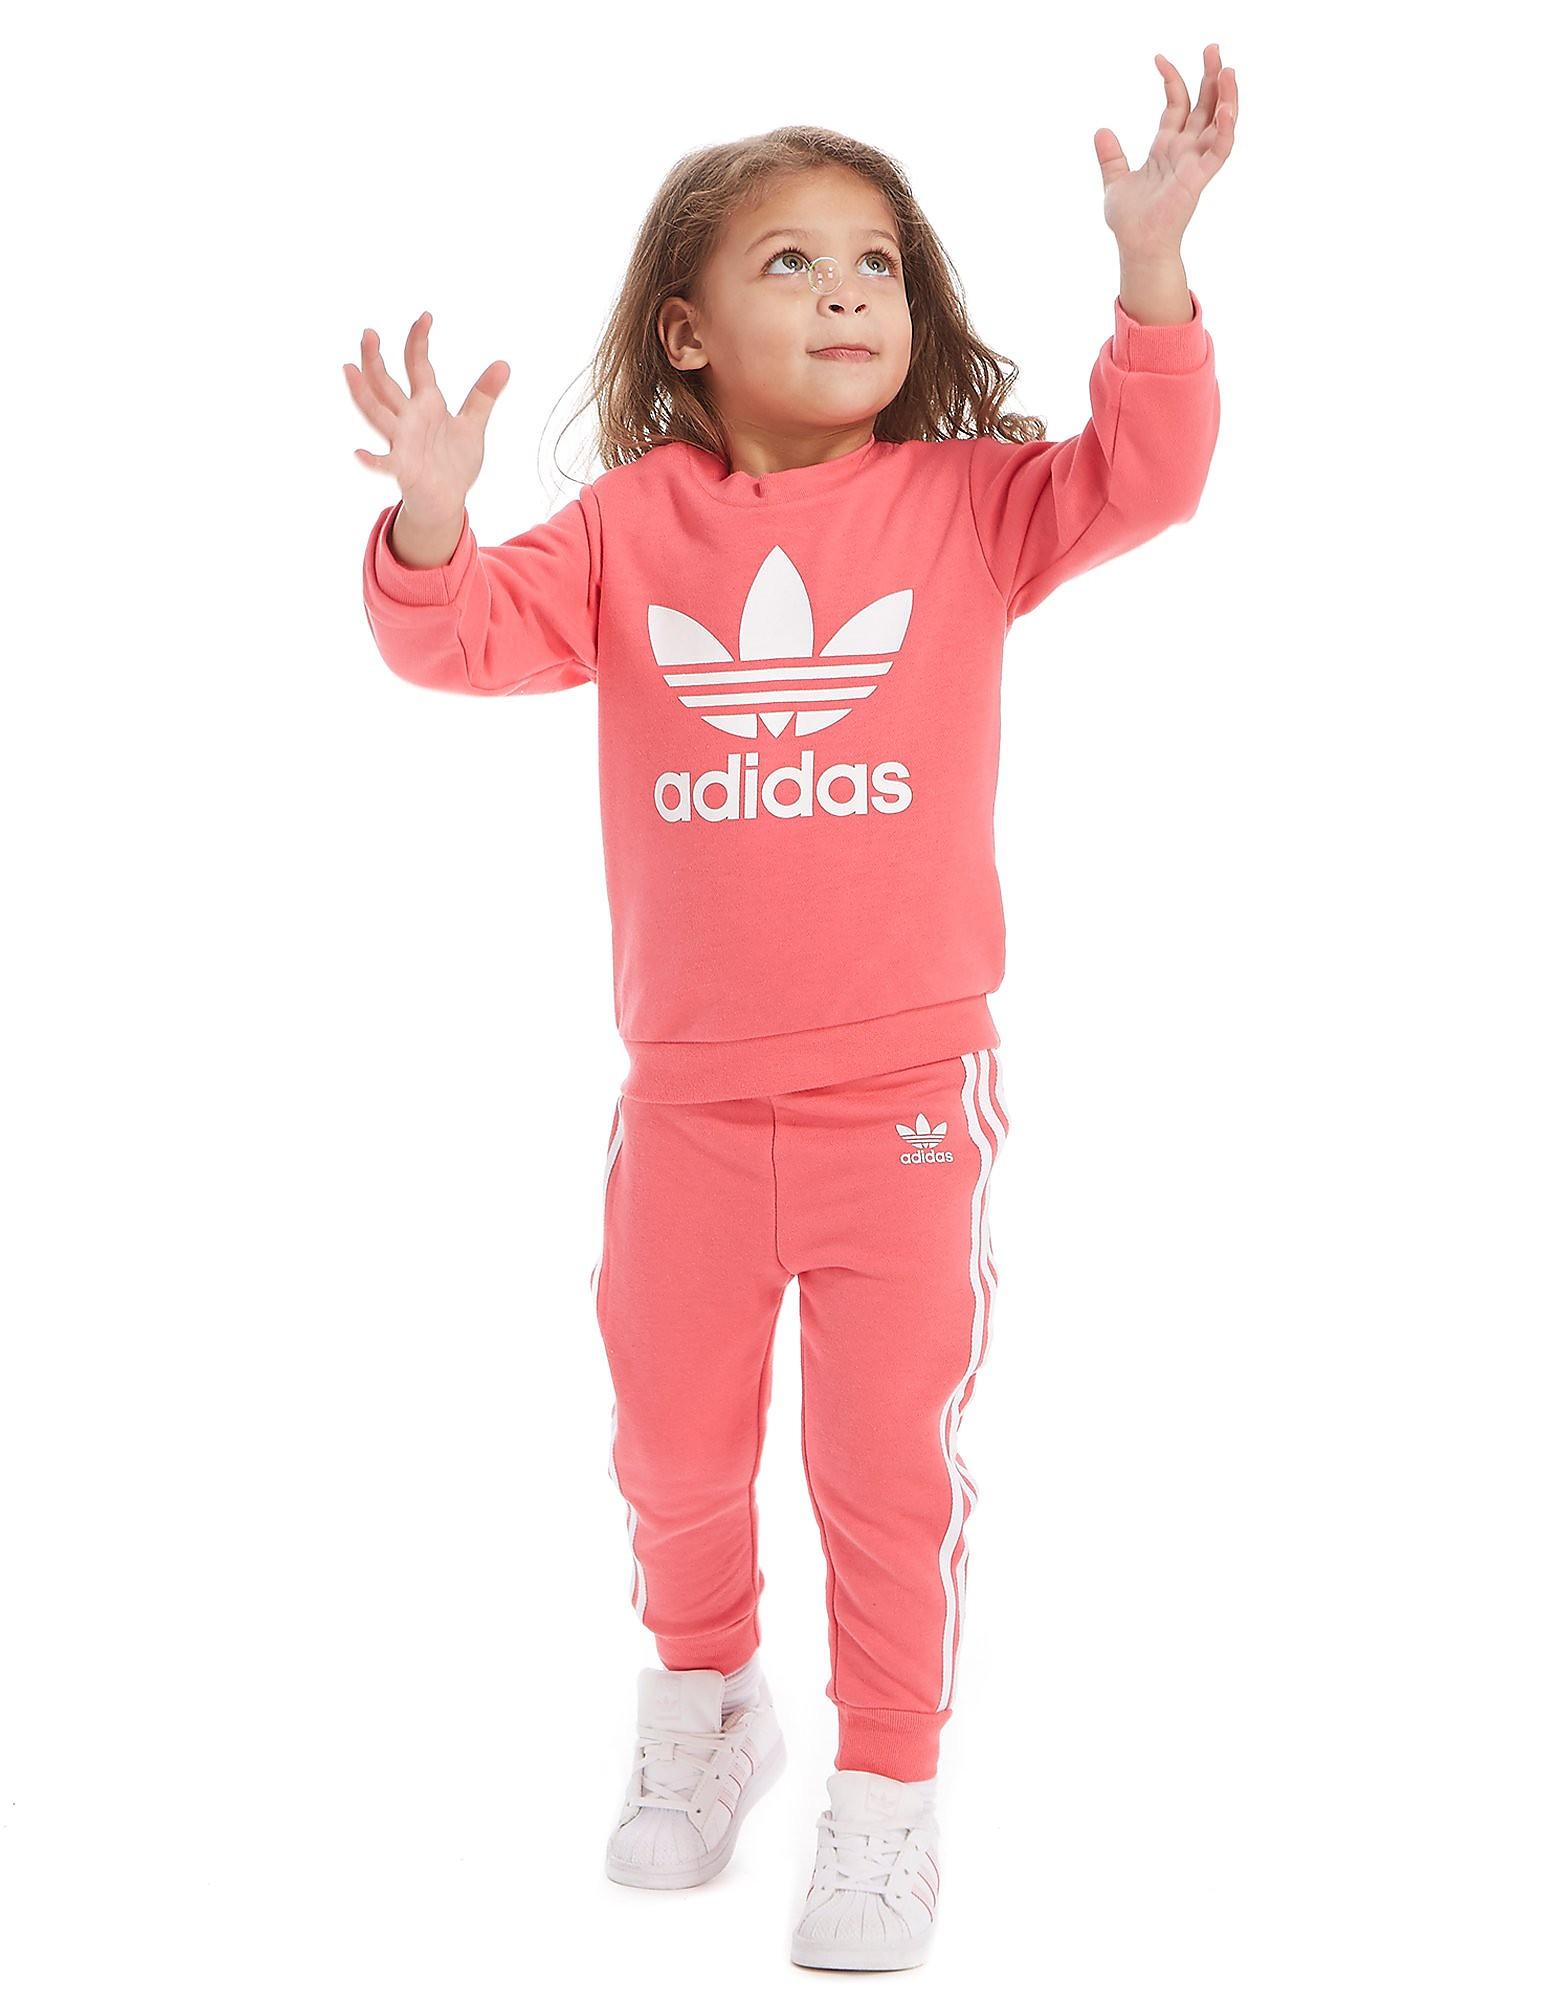 adidas Originals Survêtement Girls' Adicolor Crew Bébé